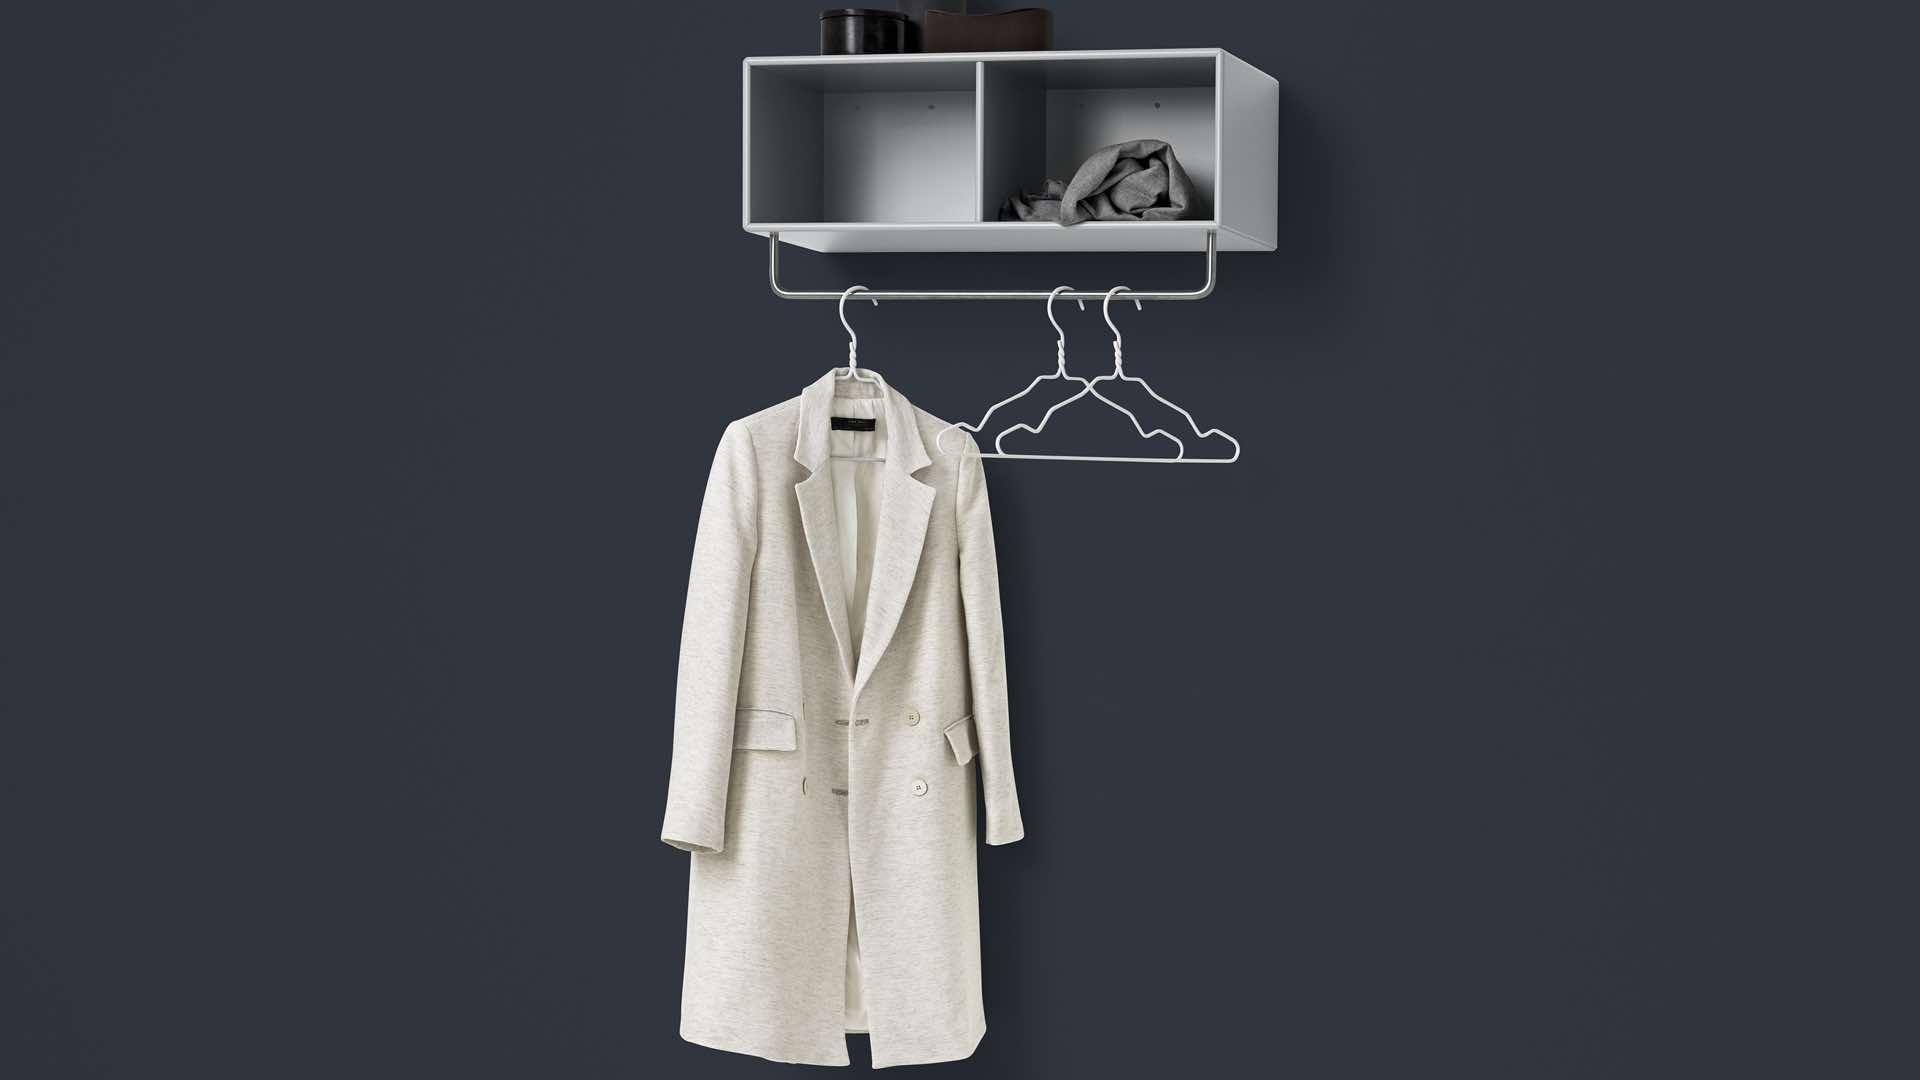 thonetshop montana coat regal mit kleiderstange. Black Bedroom Furniture Sets. Home Design Ideas